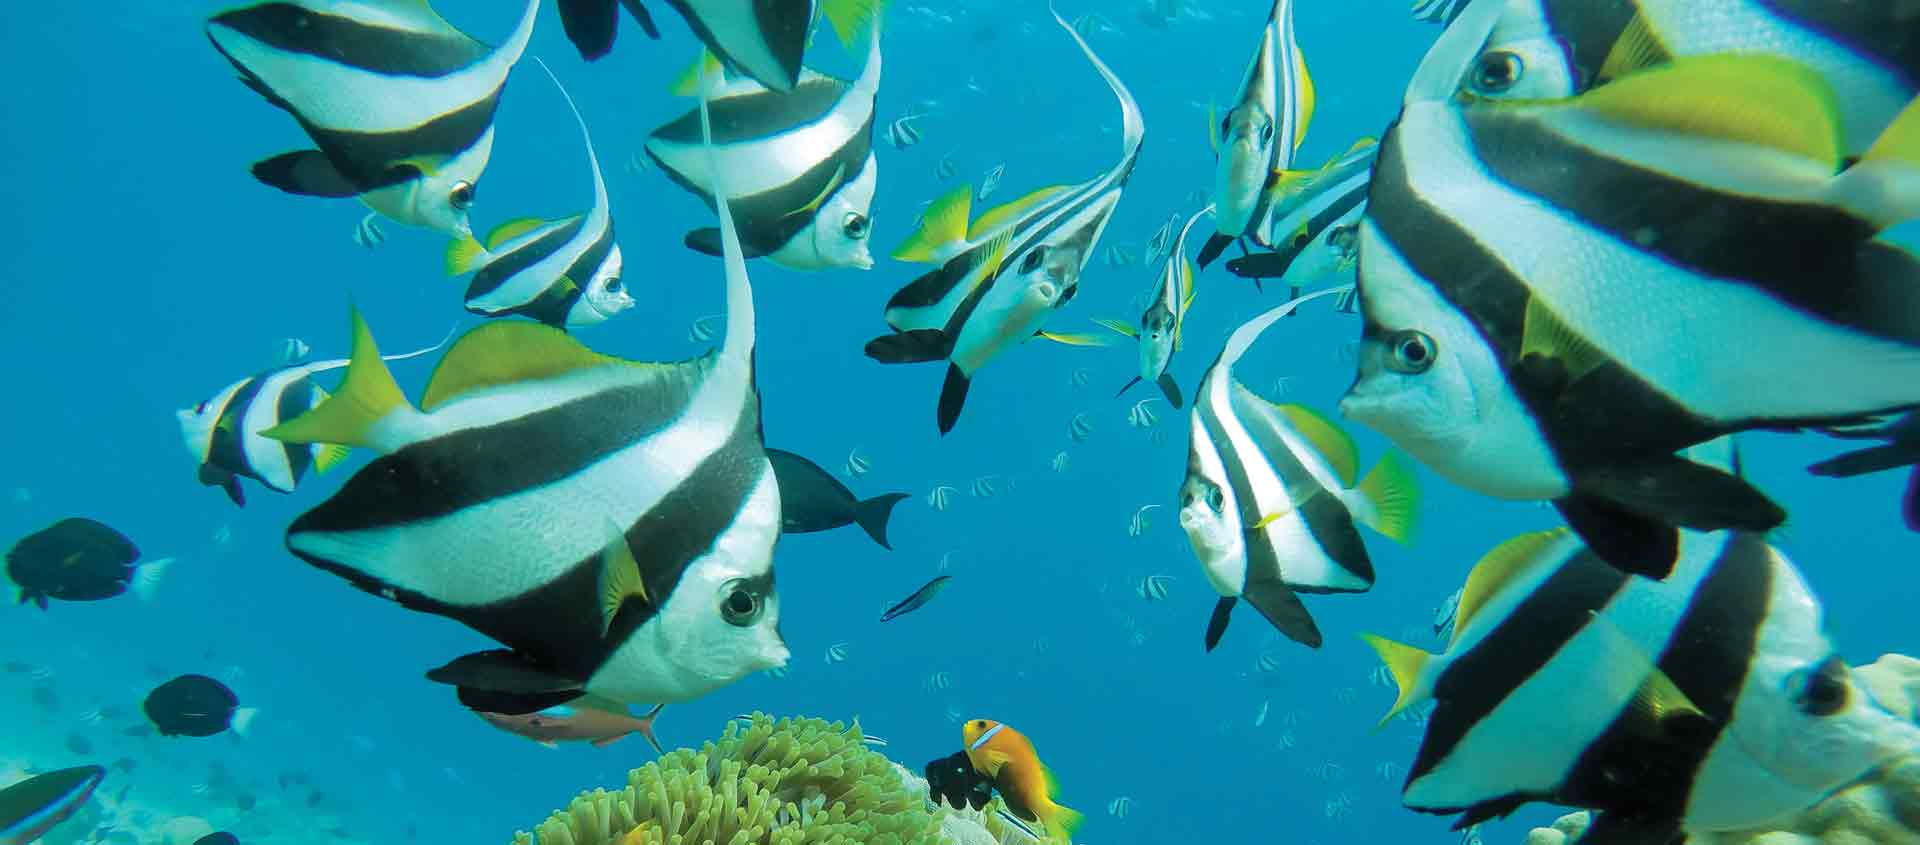 Seychelles cruise underwater photo of butterflyfish on reef